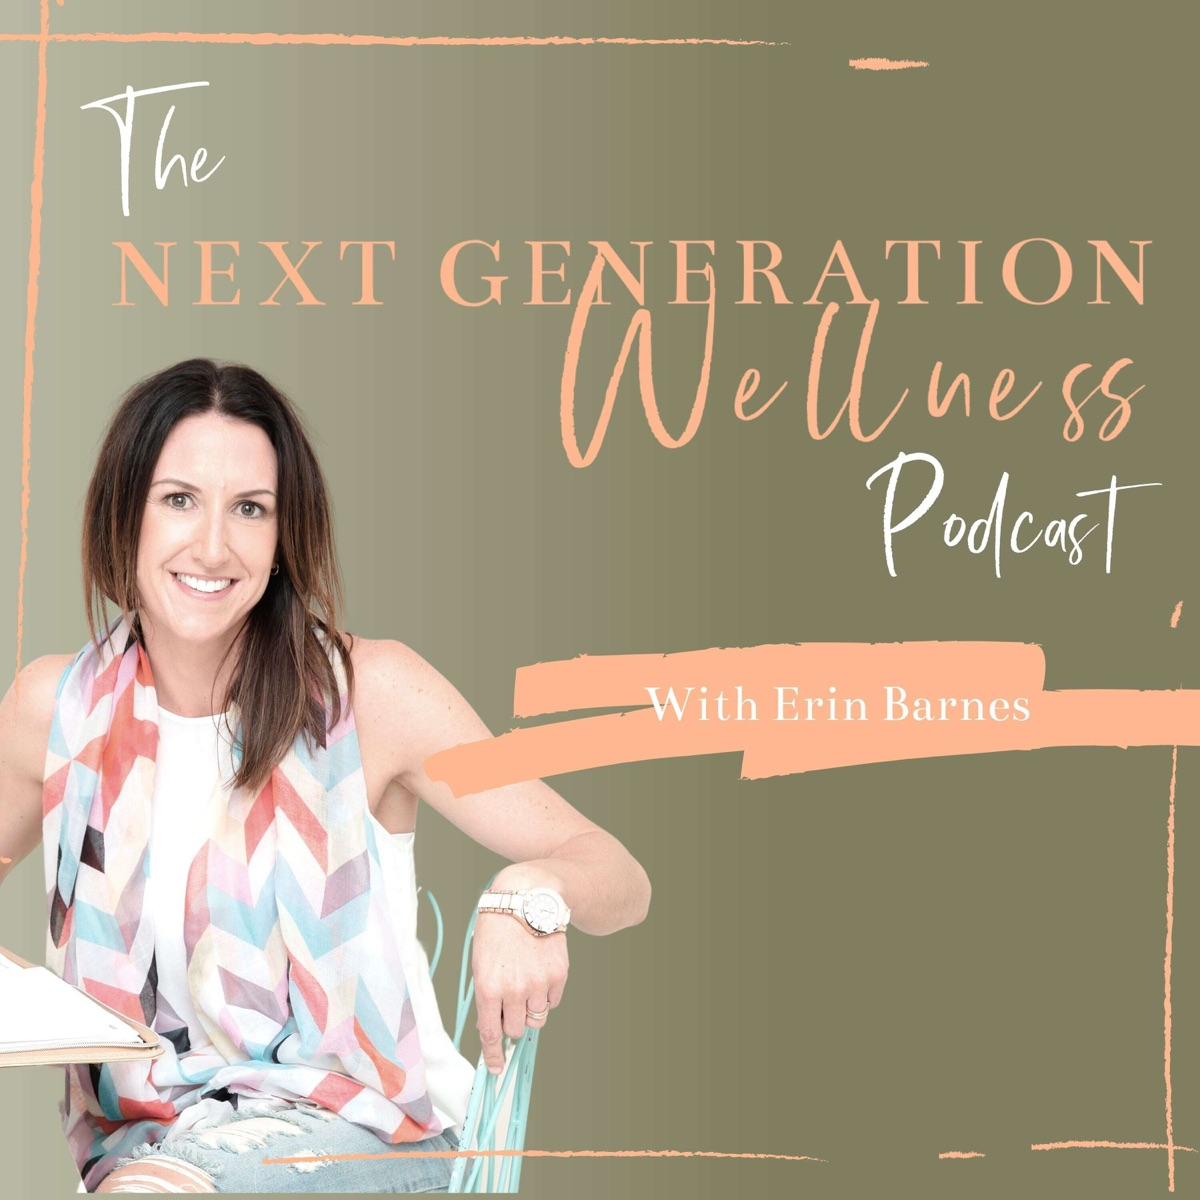 The Next Generation Wellness Podcast